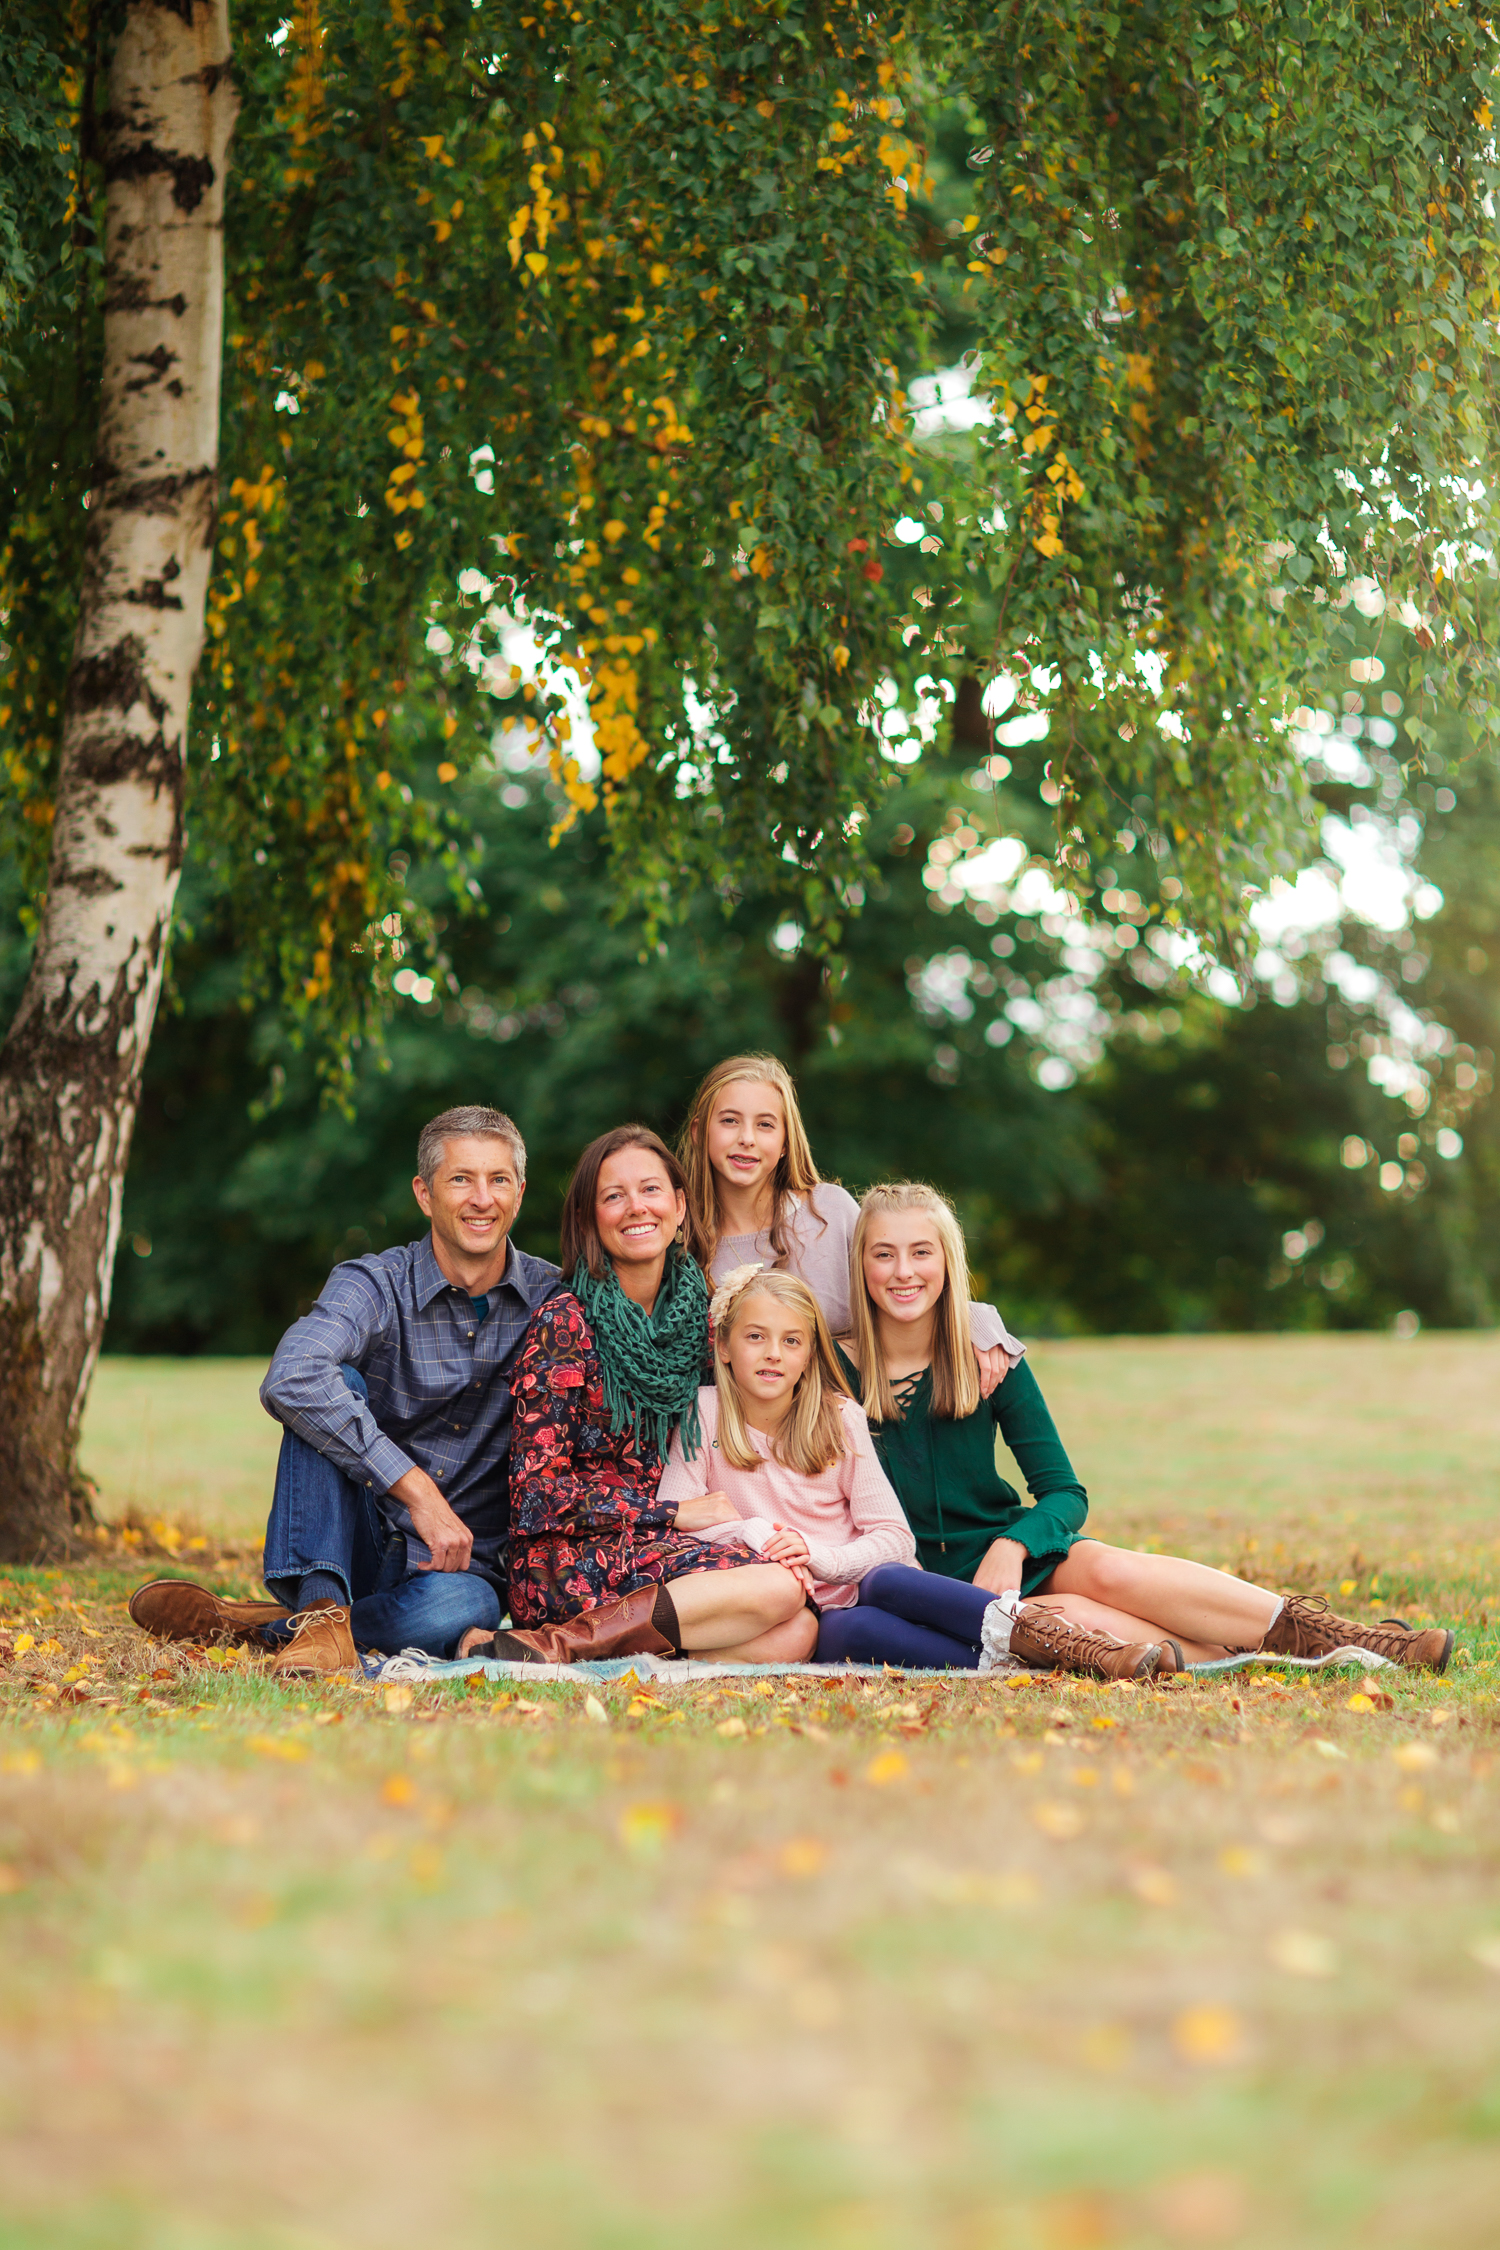 ariellanoellephotography-fall-mini-sessions-family-portraits-monroe-washington-duvall-carnation-redmond-woodinville-area-portraits-2.jpg